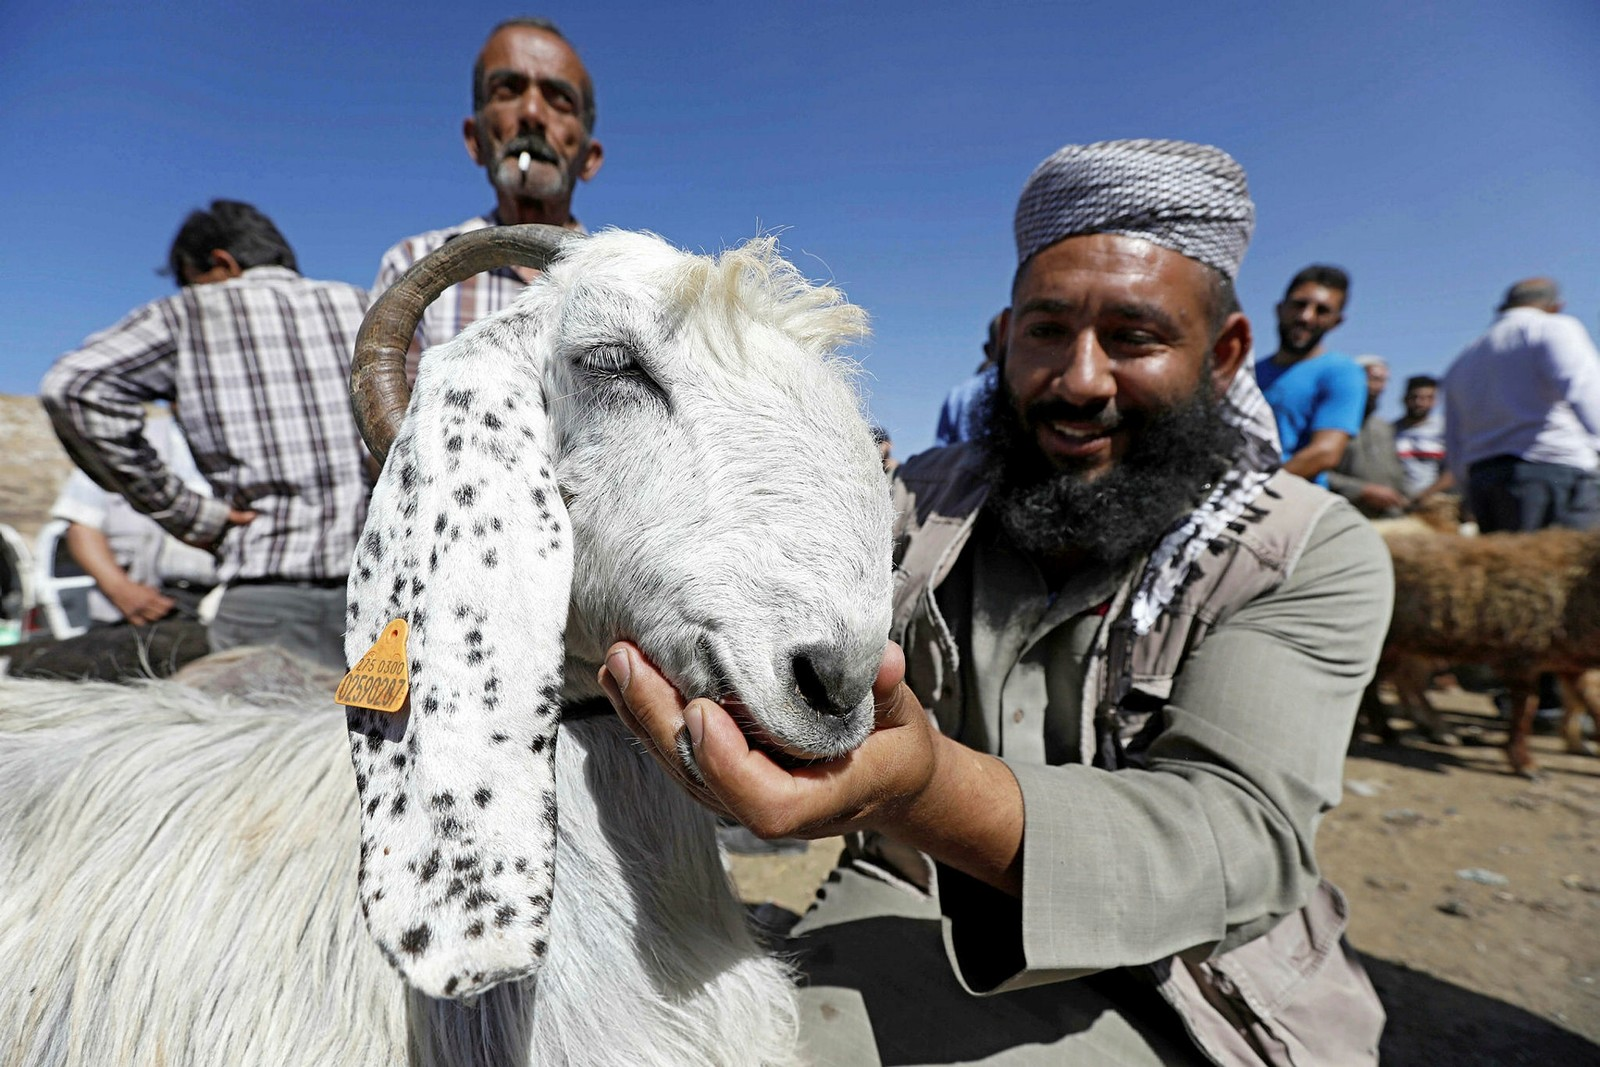 Over a billion Muslims around the world celebrate Eid al-Adha with joy